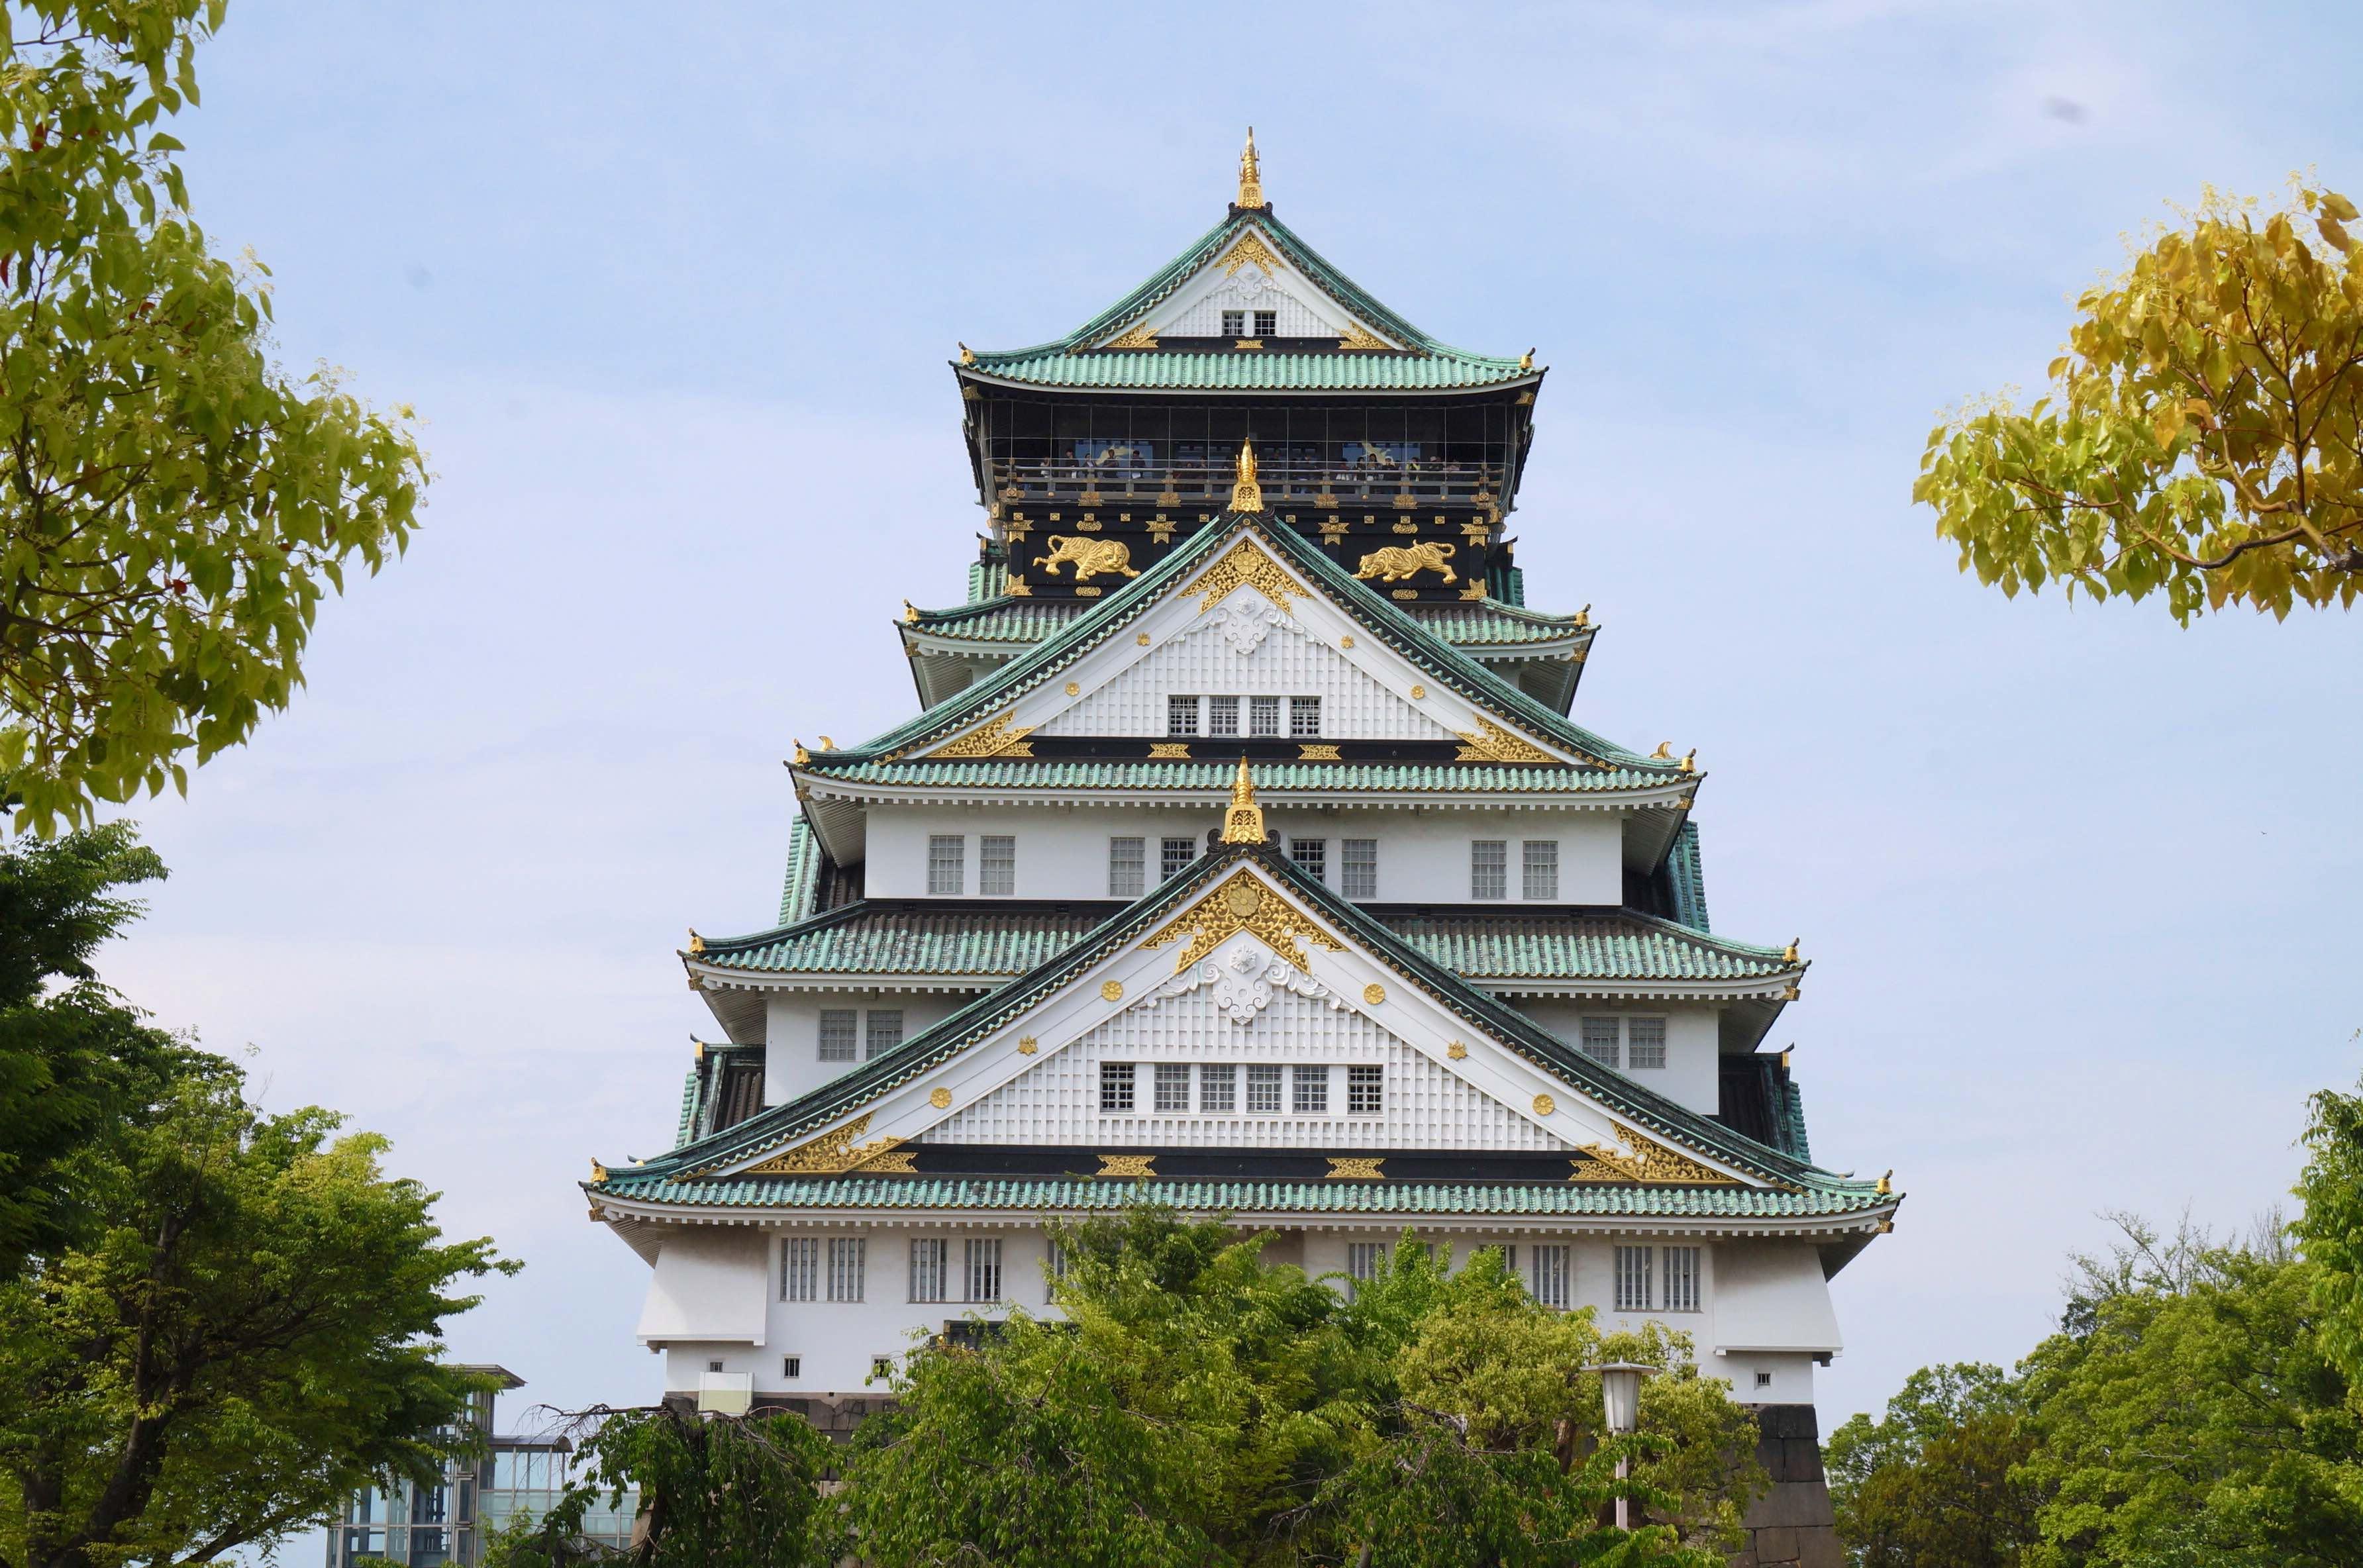 osaka-jo, chateau d'osaka, osaka, japon